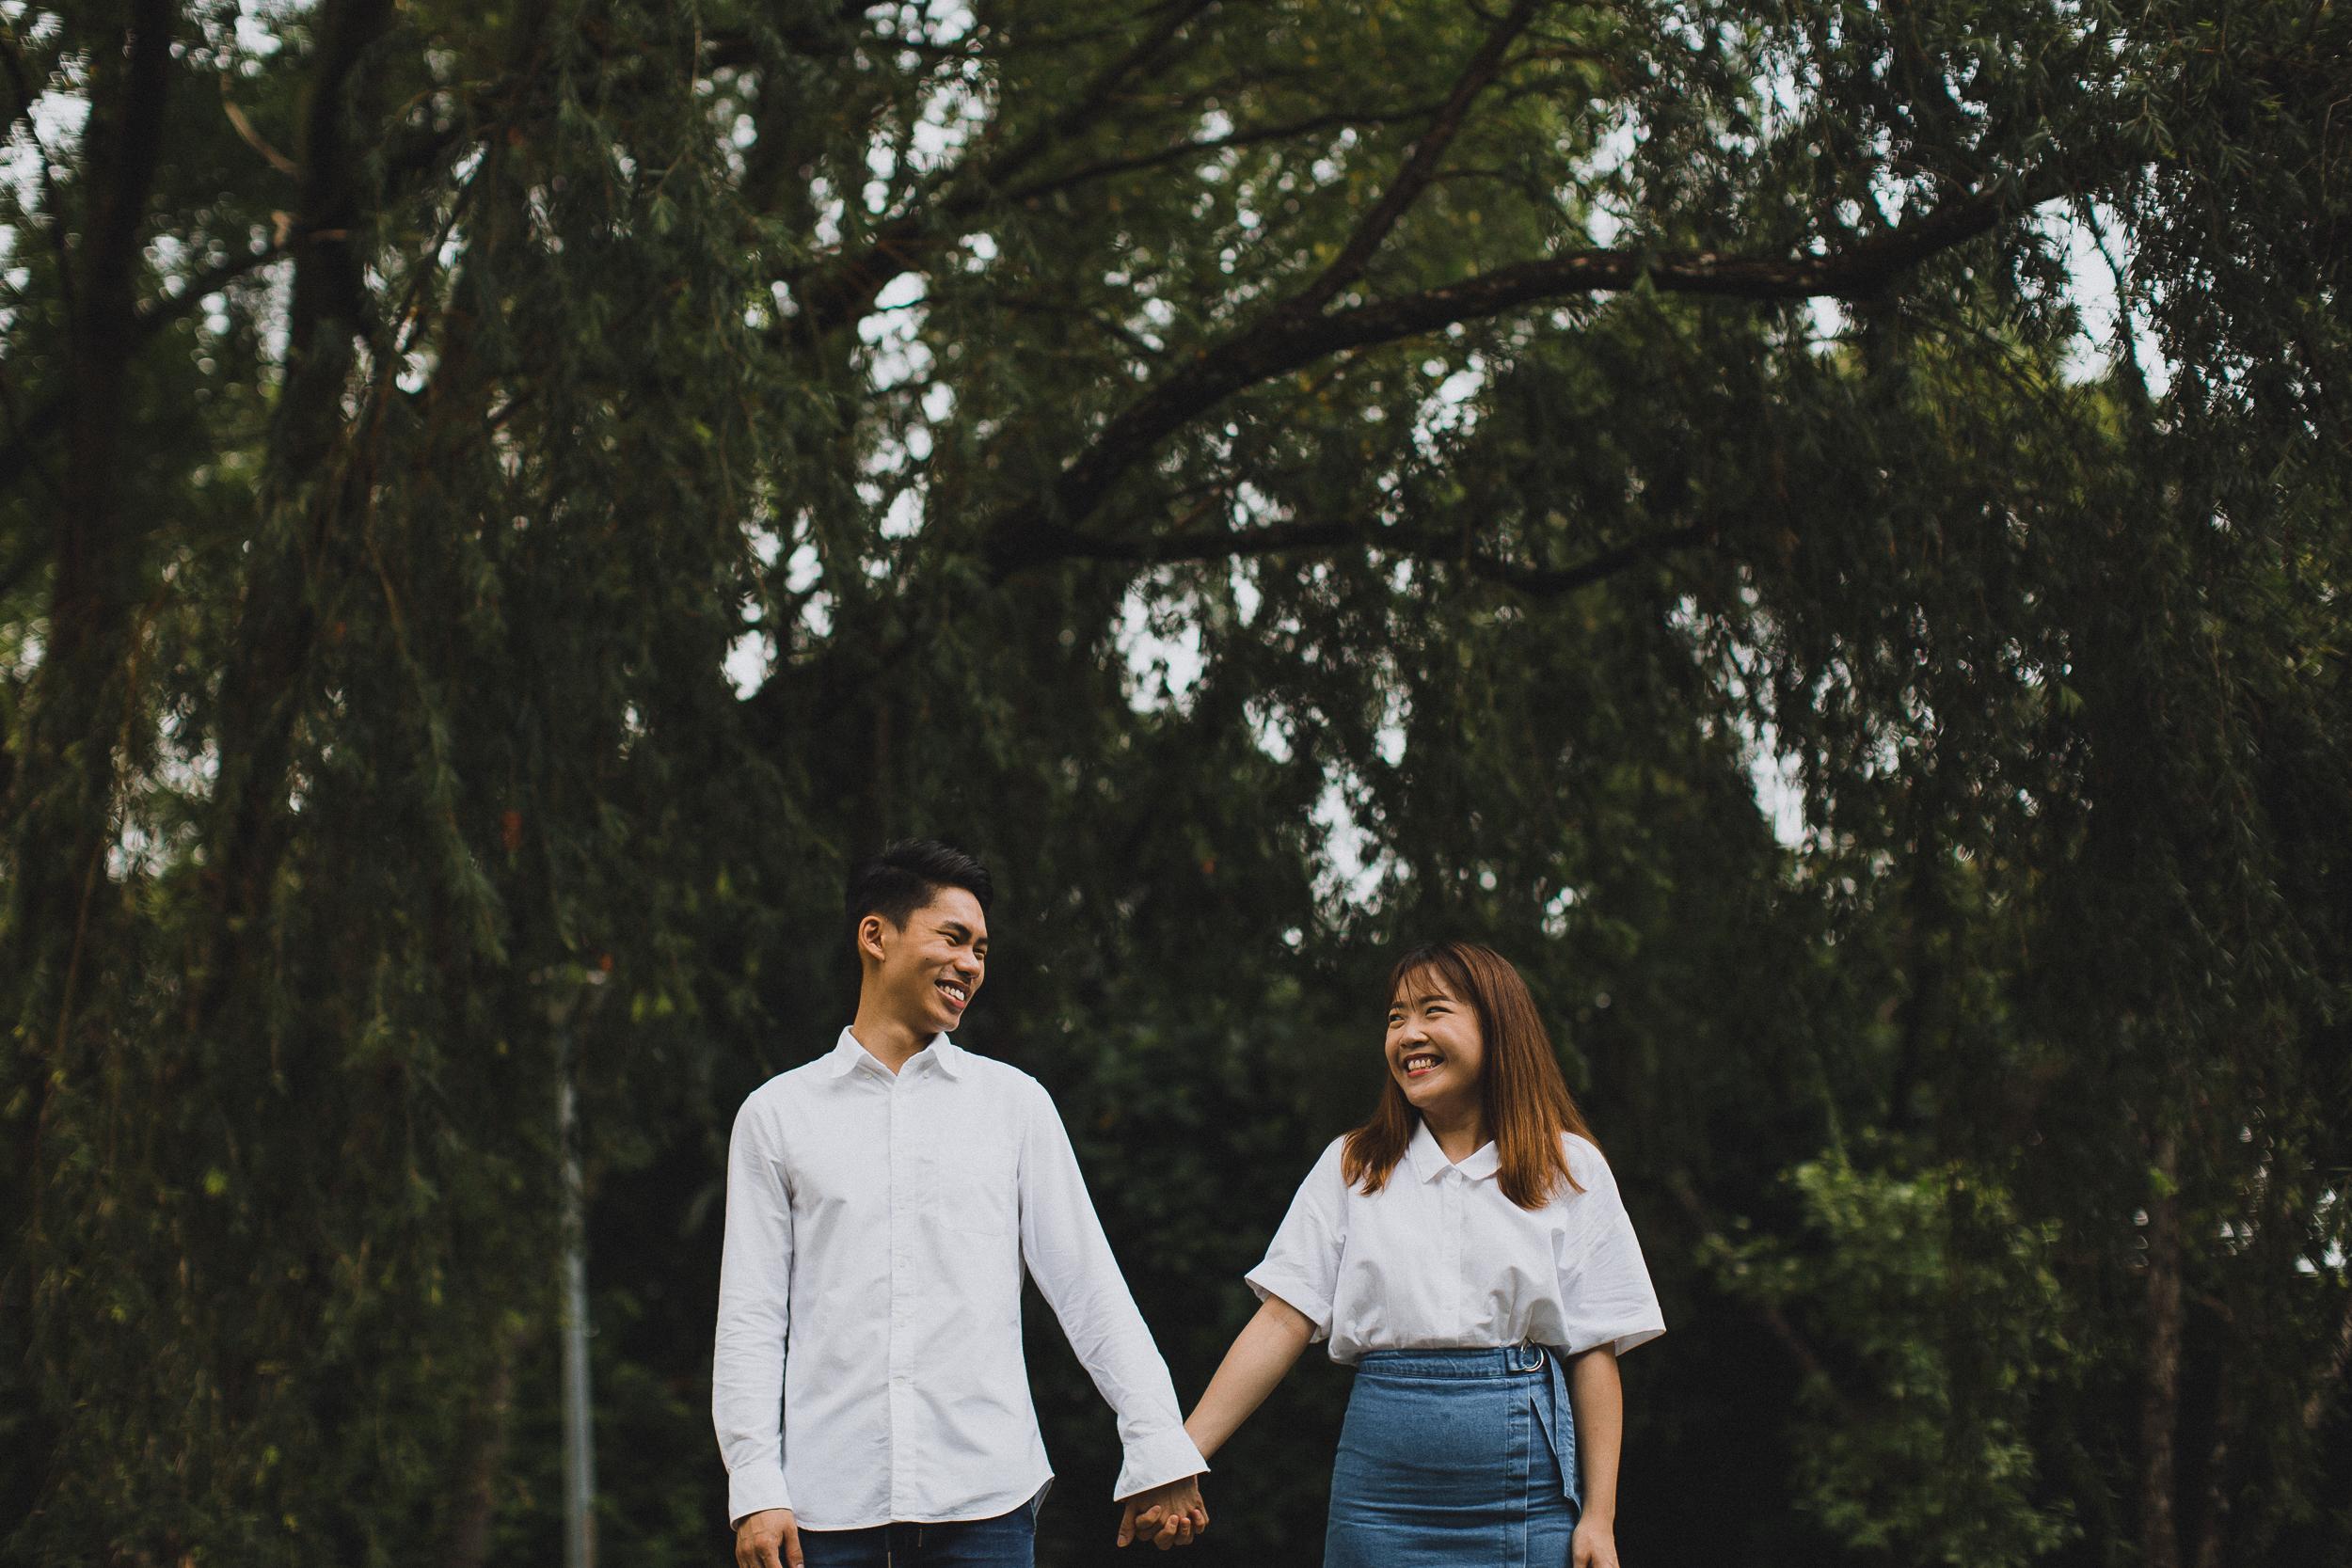 Singapore+Wedding+Photographer+Pre-Wedding+Couple+Zhiyu+Huimin-0007.jpg